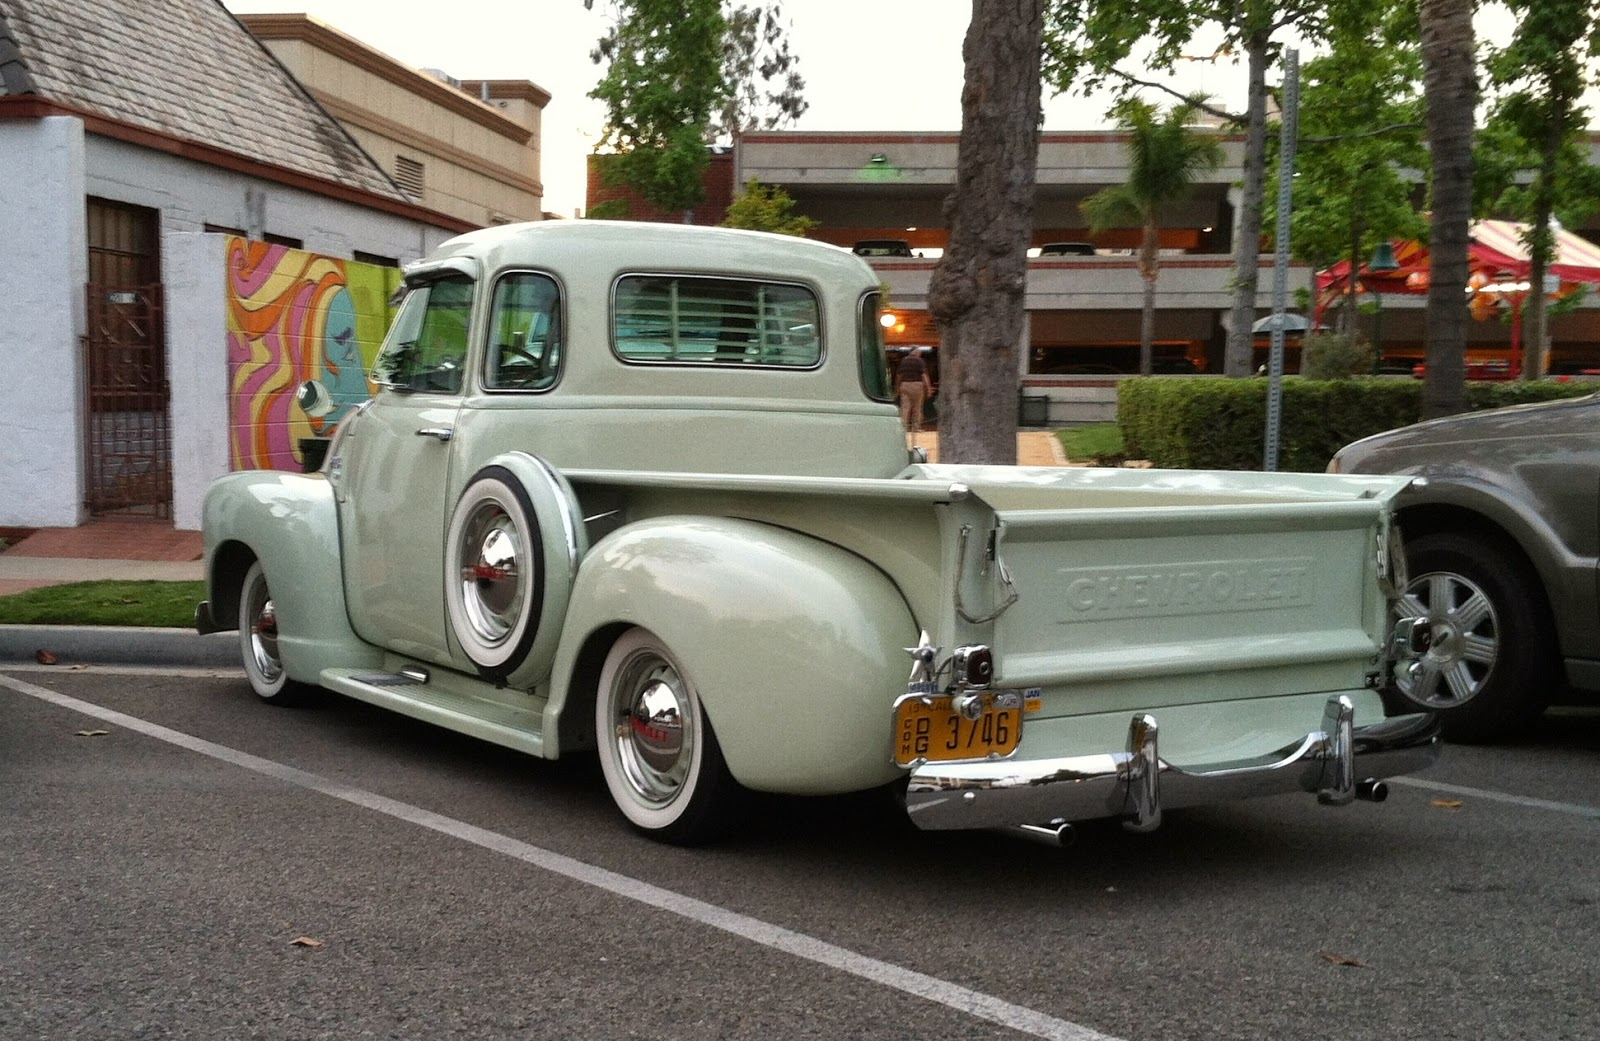 1949 Chevy Panel Truck Original Van Nostalgia On Wheels Amazing 1600x1041